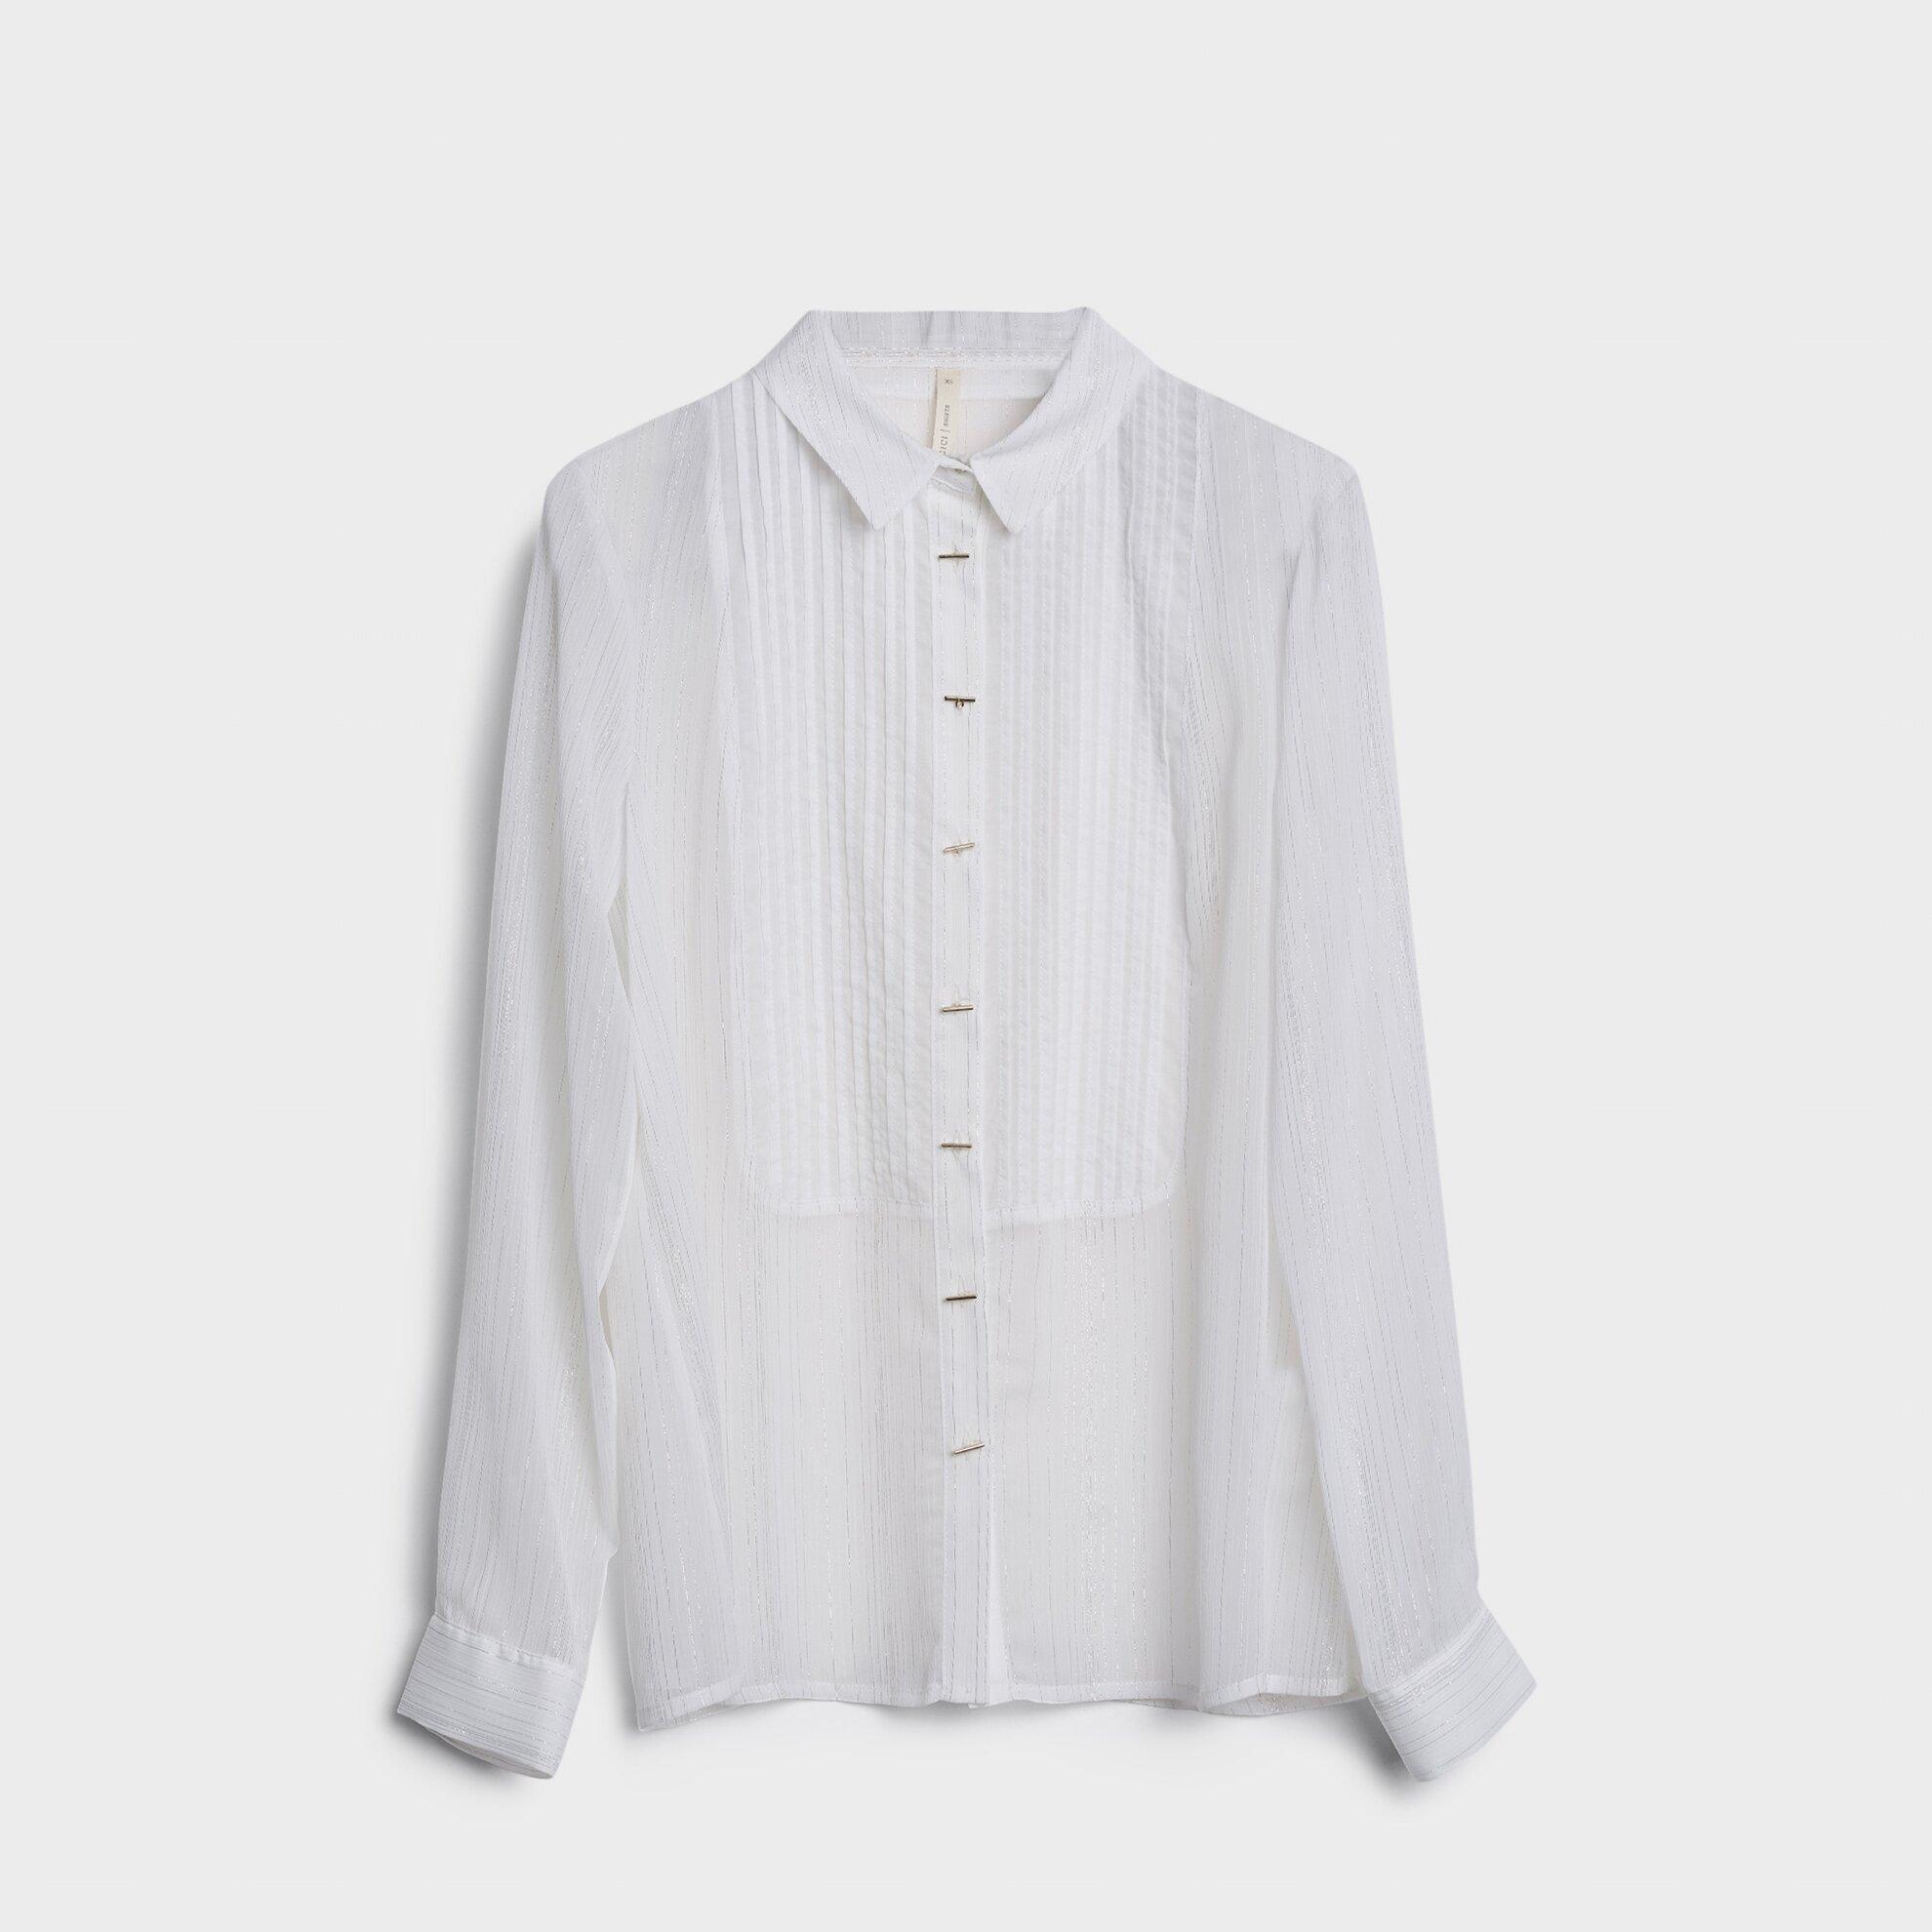 Garni Detaylı Gömlek